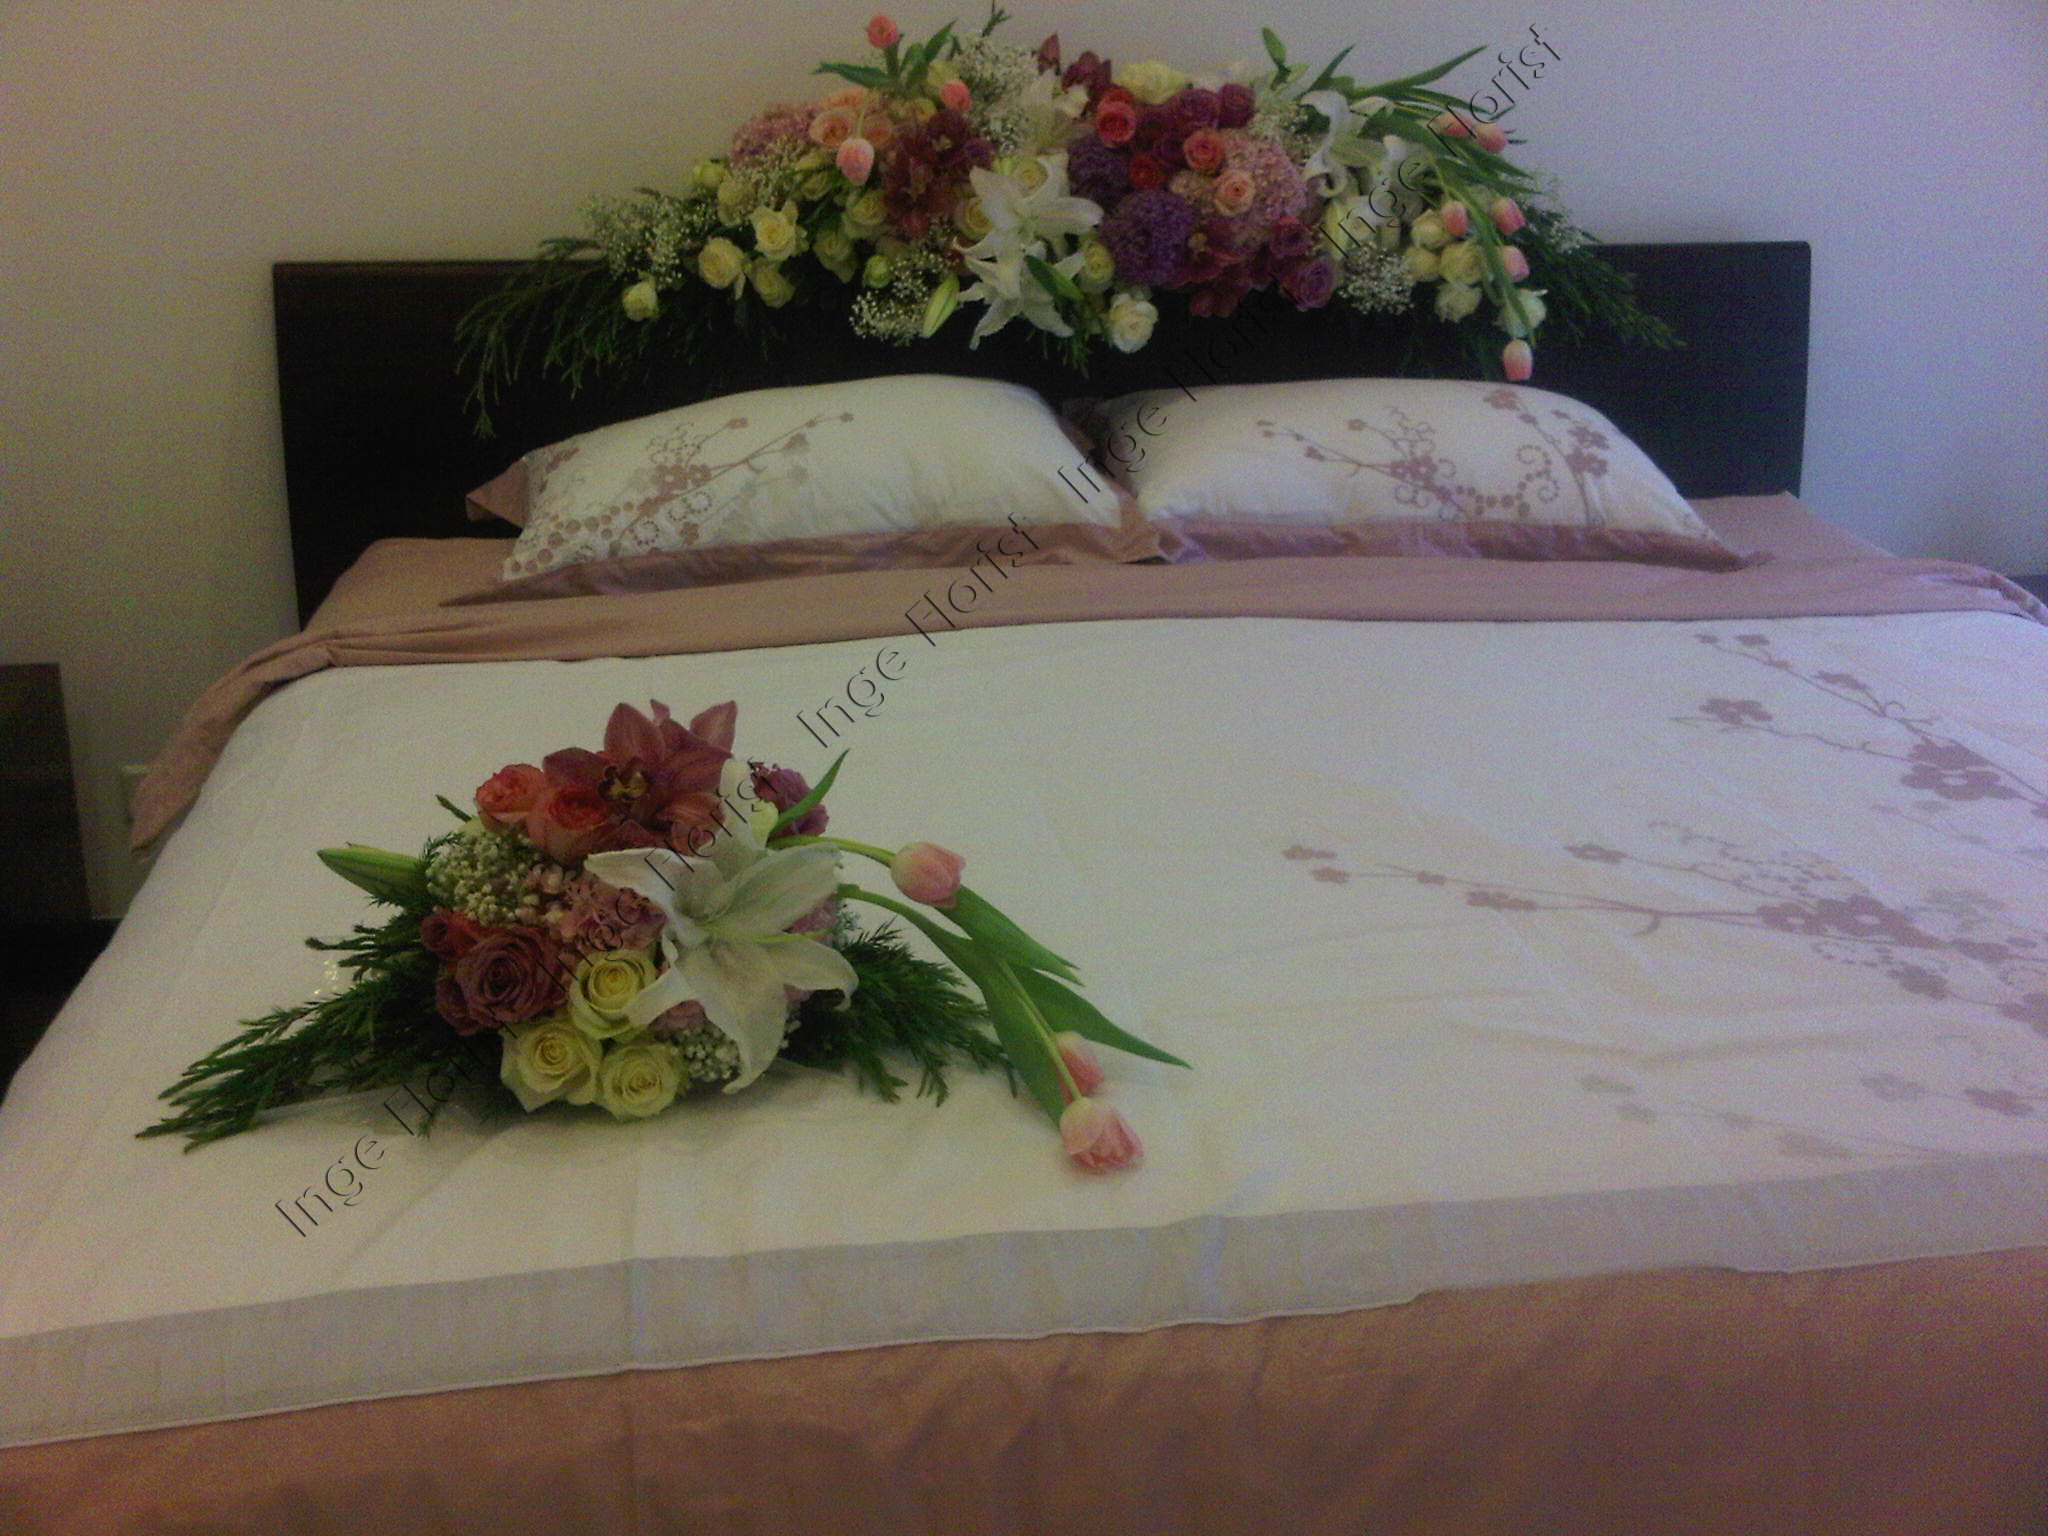 Kamar Pengantin Inge Florist Wedding Decoration Dekorasi Pernikahan Pernikahan Dekorasi Perkawinan Holy Matrimony Dekorasi Gereja Dekorasi Dekorasi Ulang Tahun Rangkaian Bunga Bunga